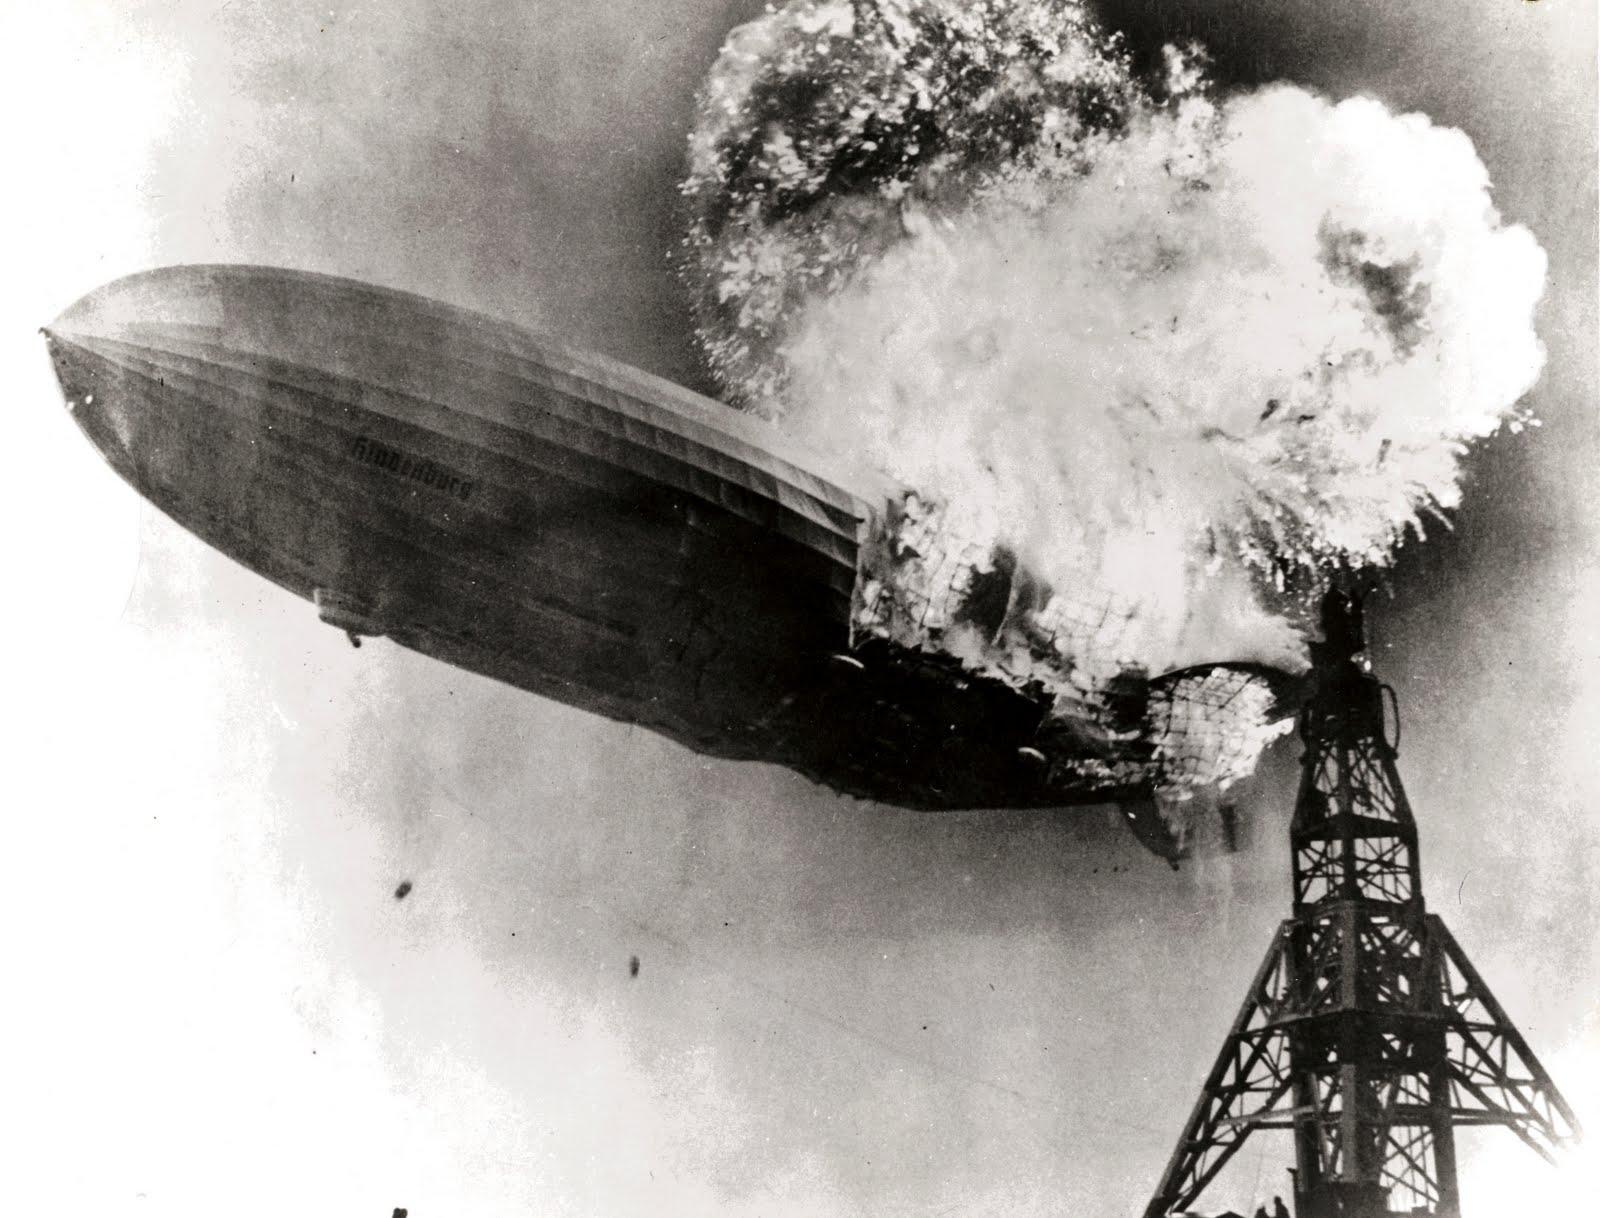 Hindenburg LZ-129 crash at Lakehurst New Jersey